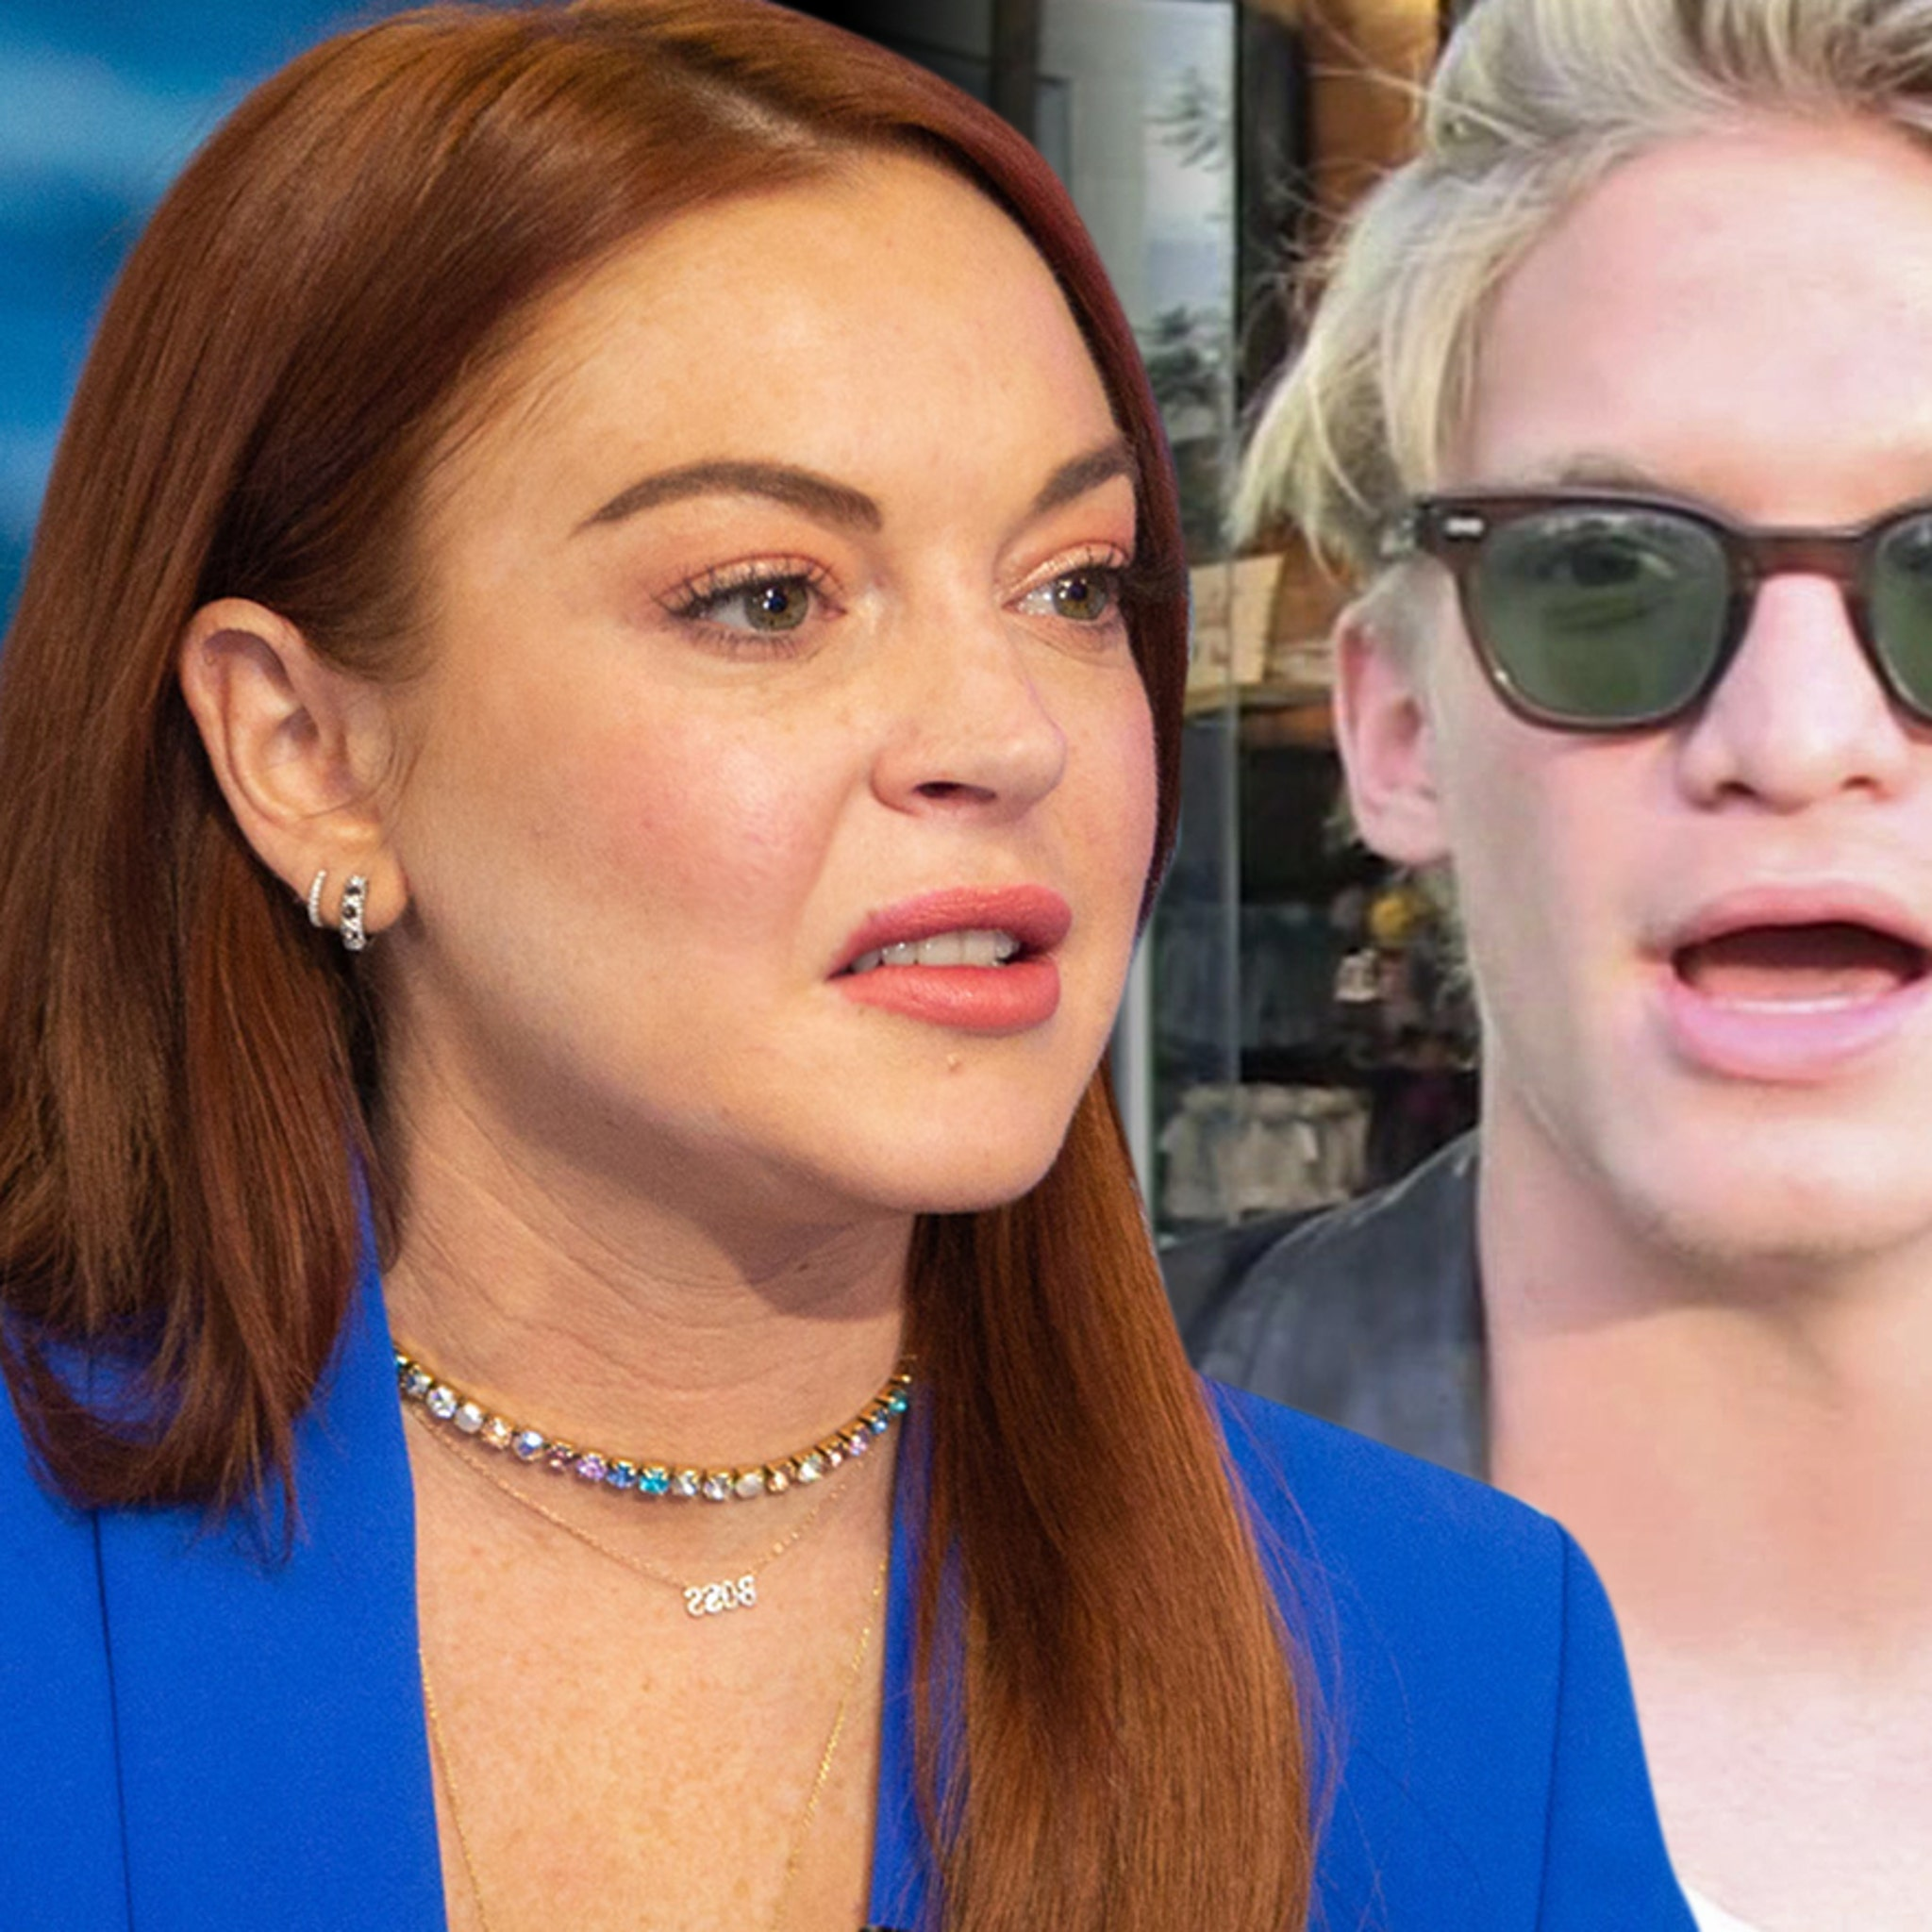 Lindsay Lohan Calls Out Cody Simpson, Shades Miley Cyrus